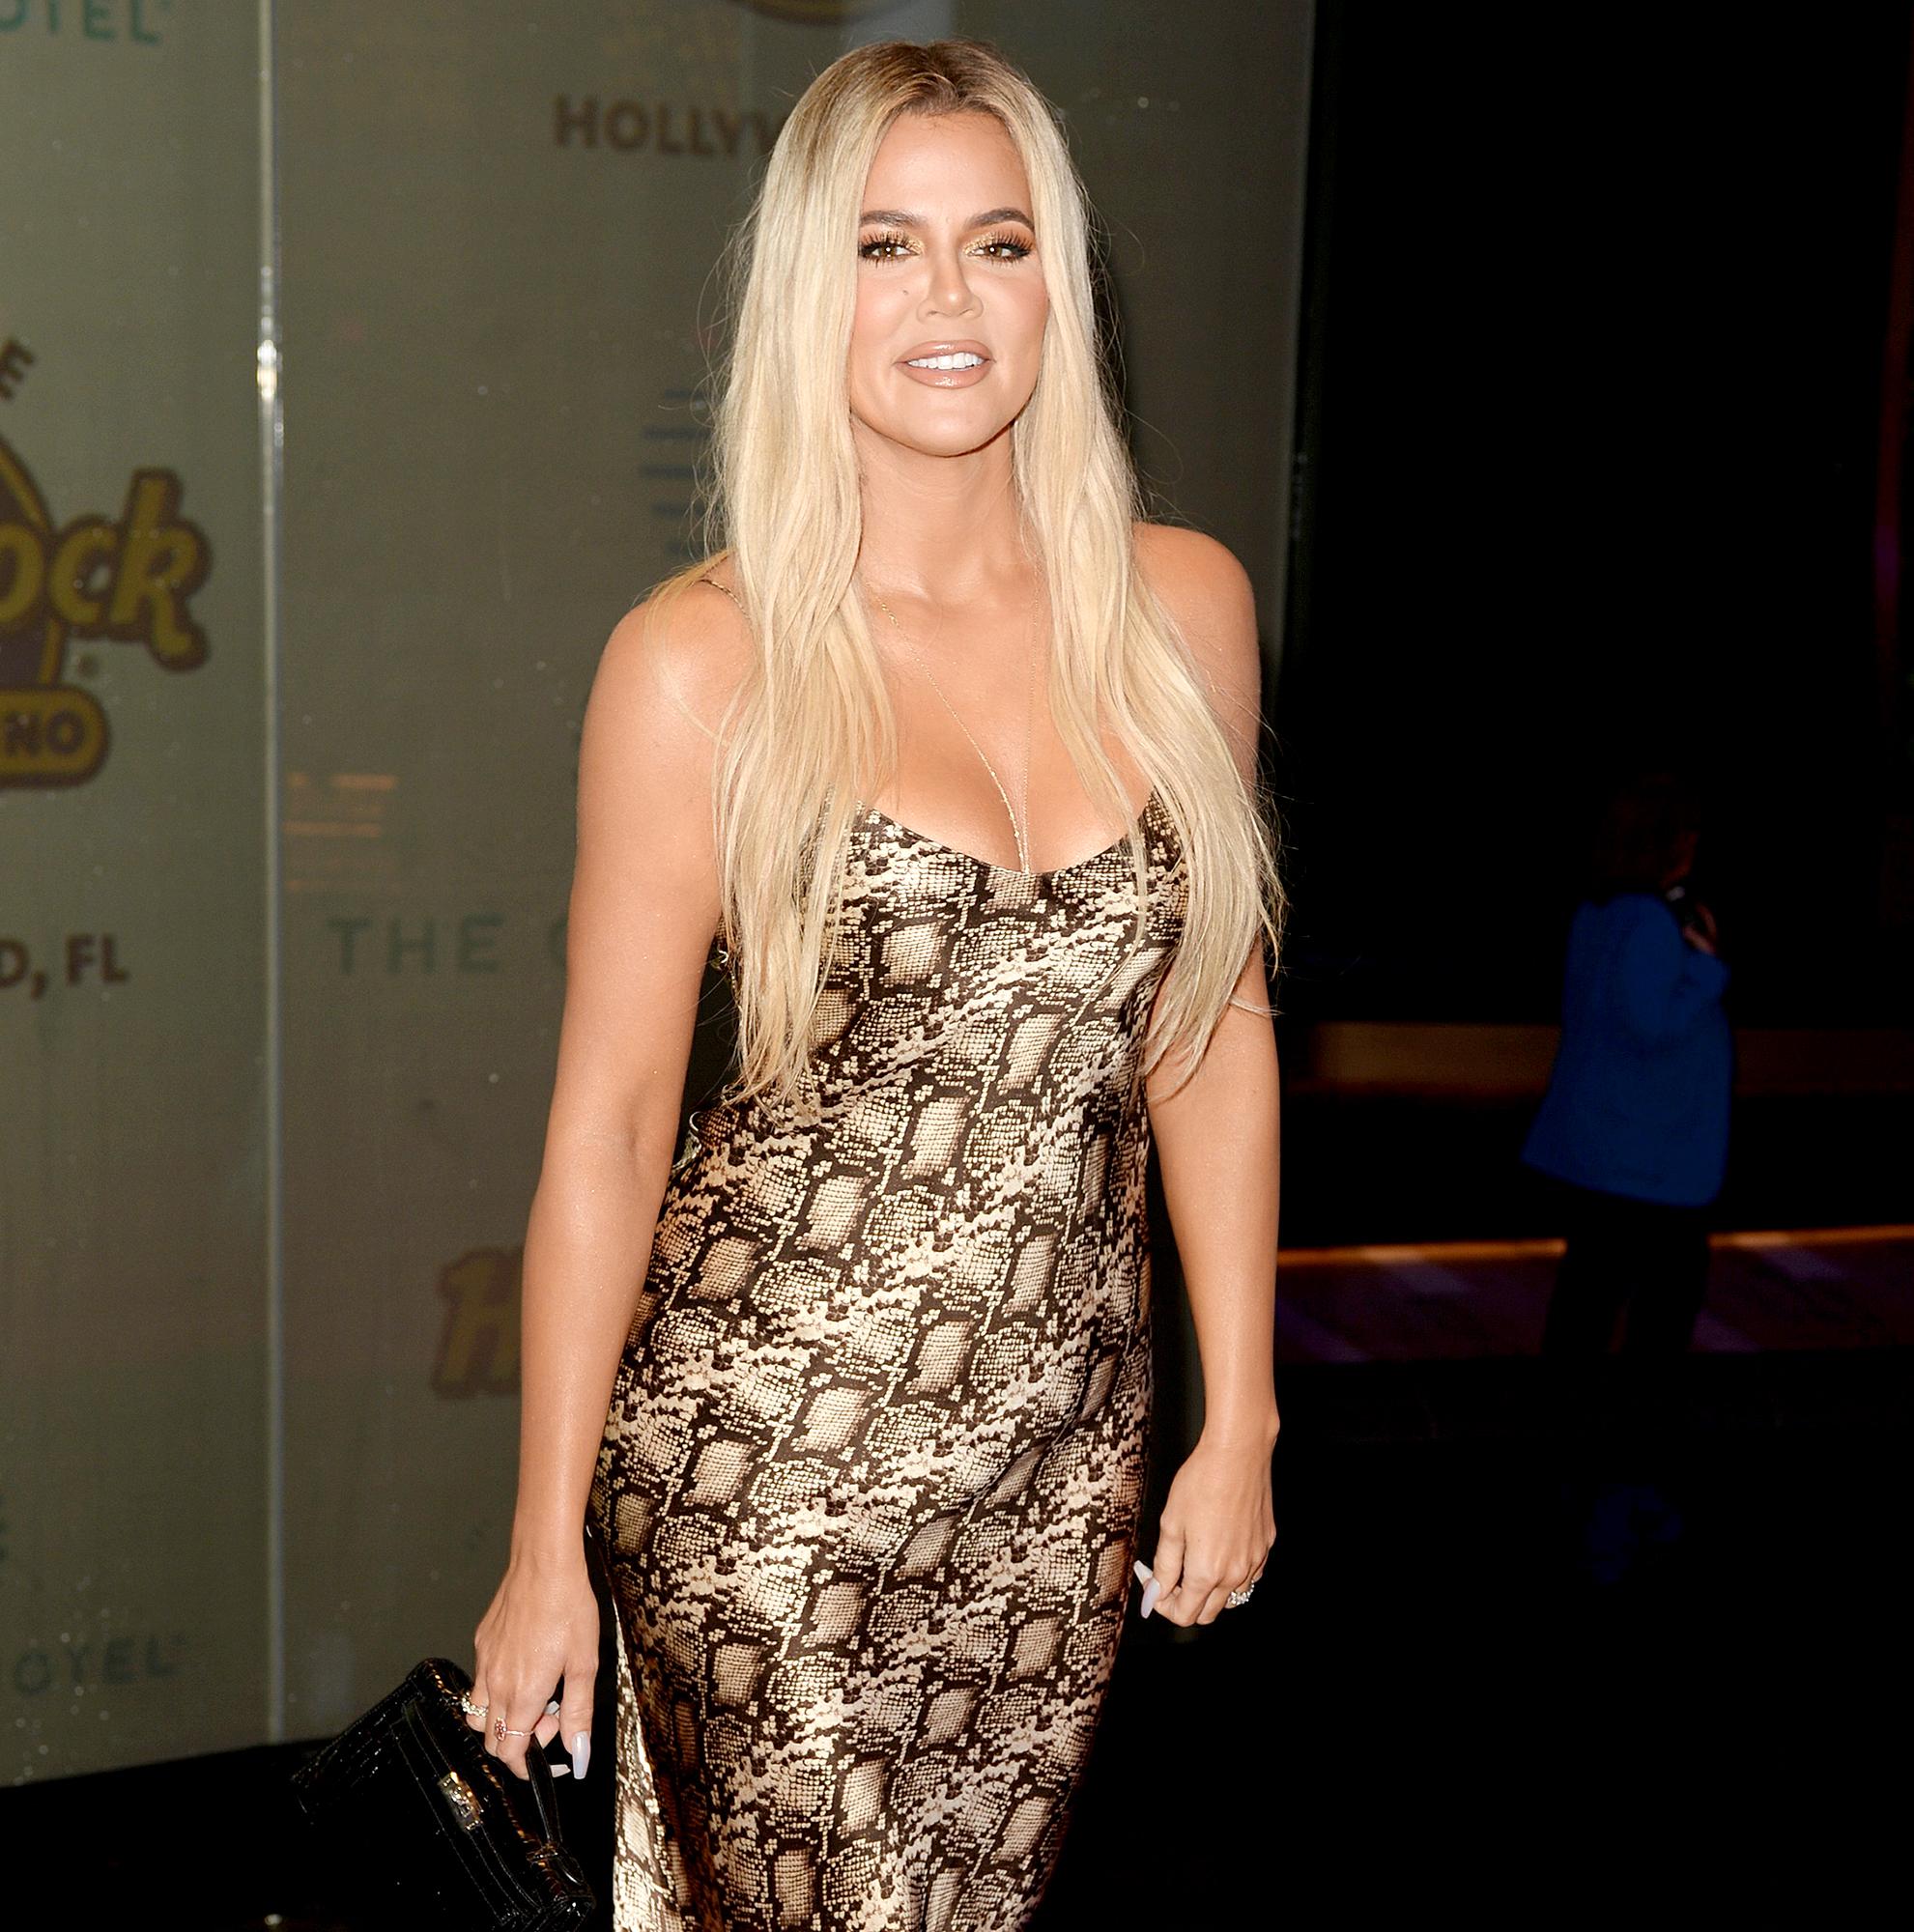 Khloe Kardashian Shows Off Custom Cookies And 1 Looks Just Like True